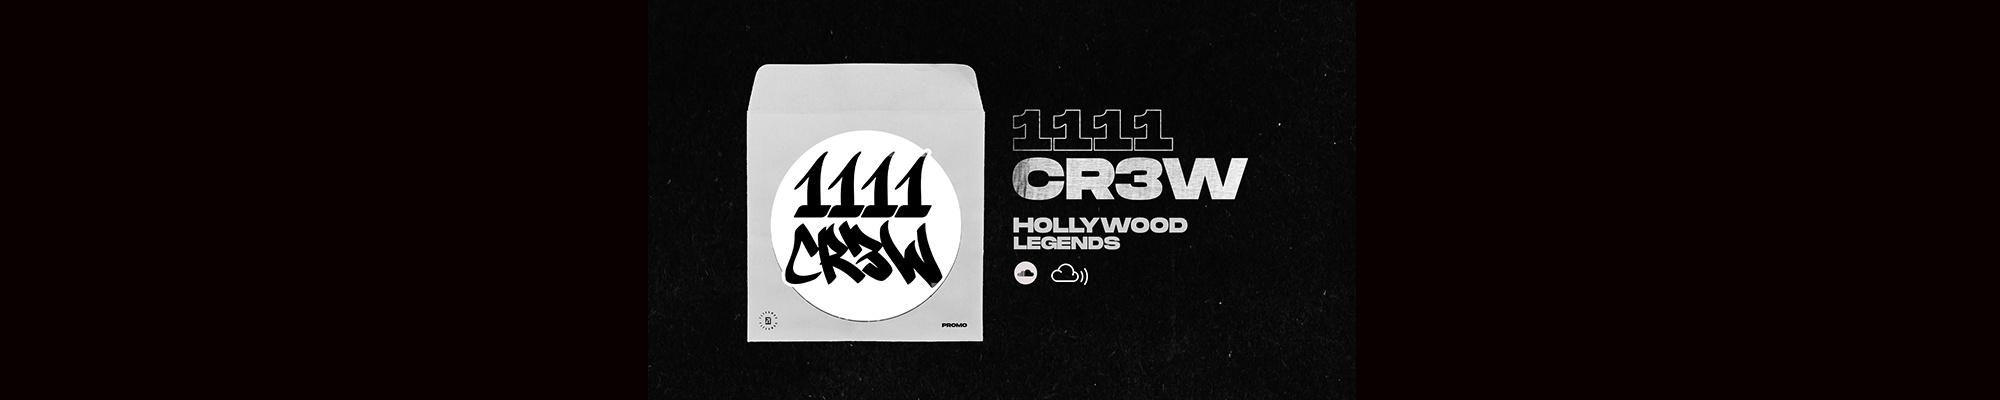 1111cr3w Cover